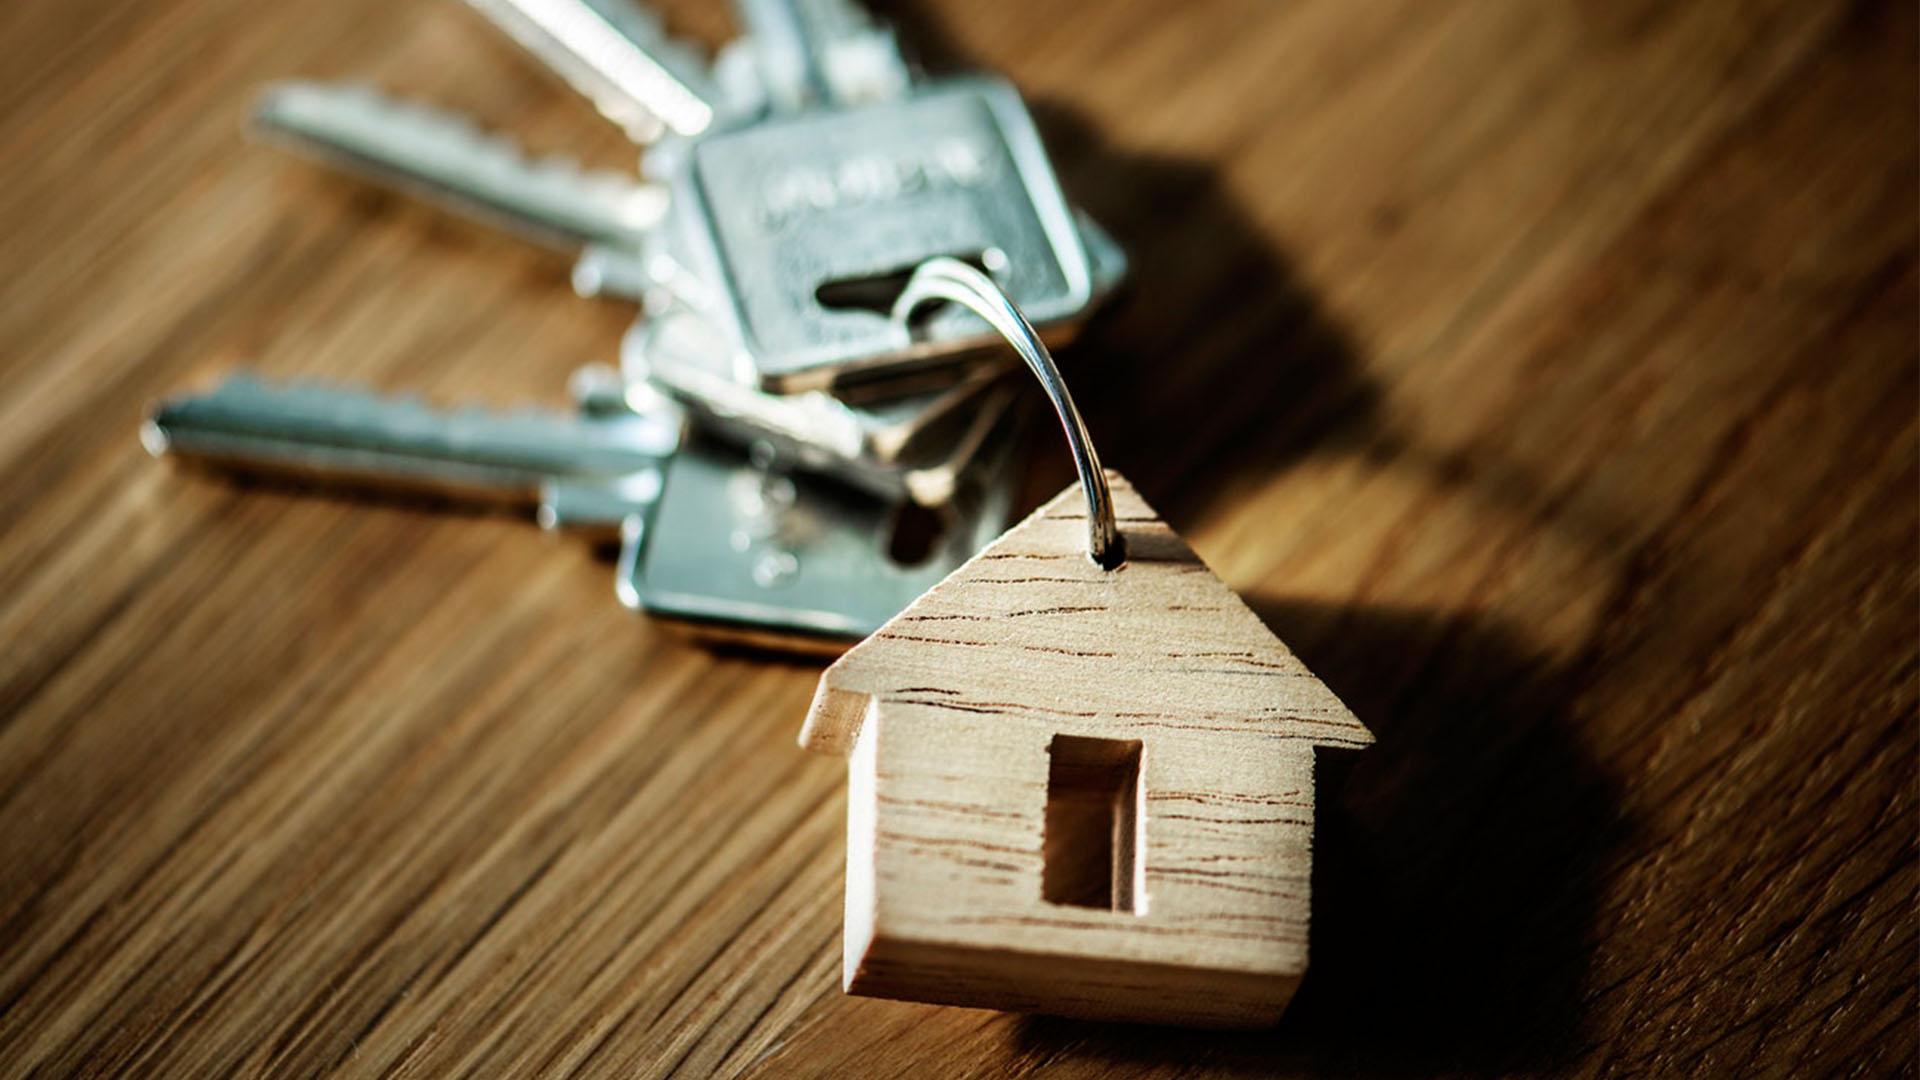 stroitelstvo_domov Веванта строит в ипотеку